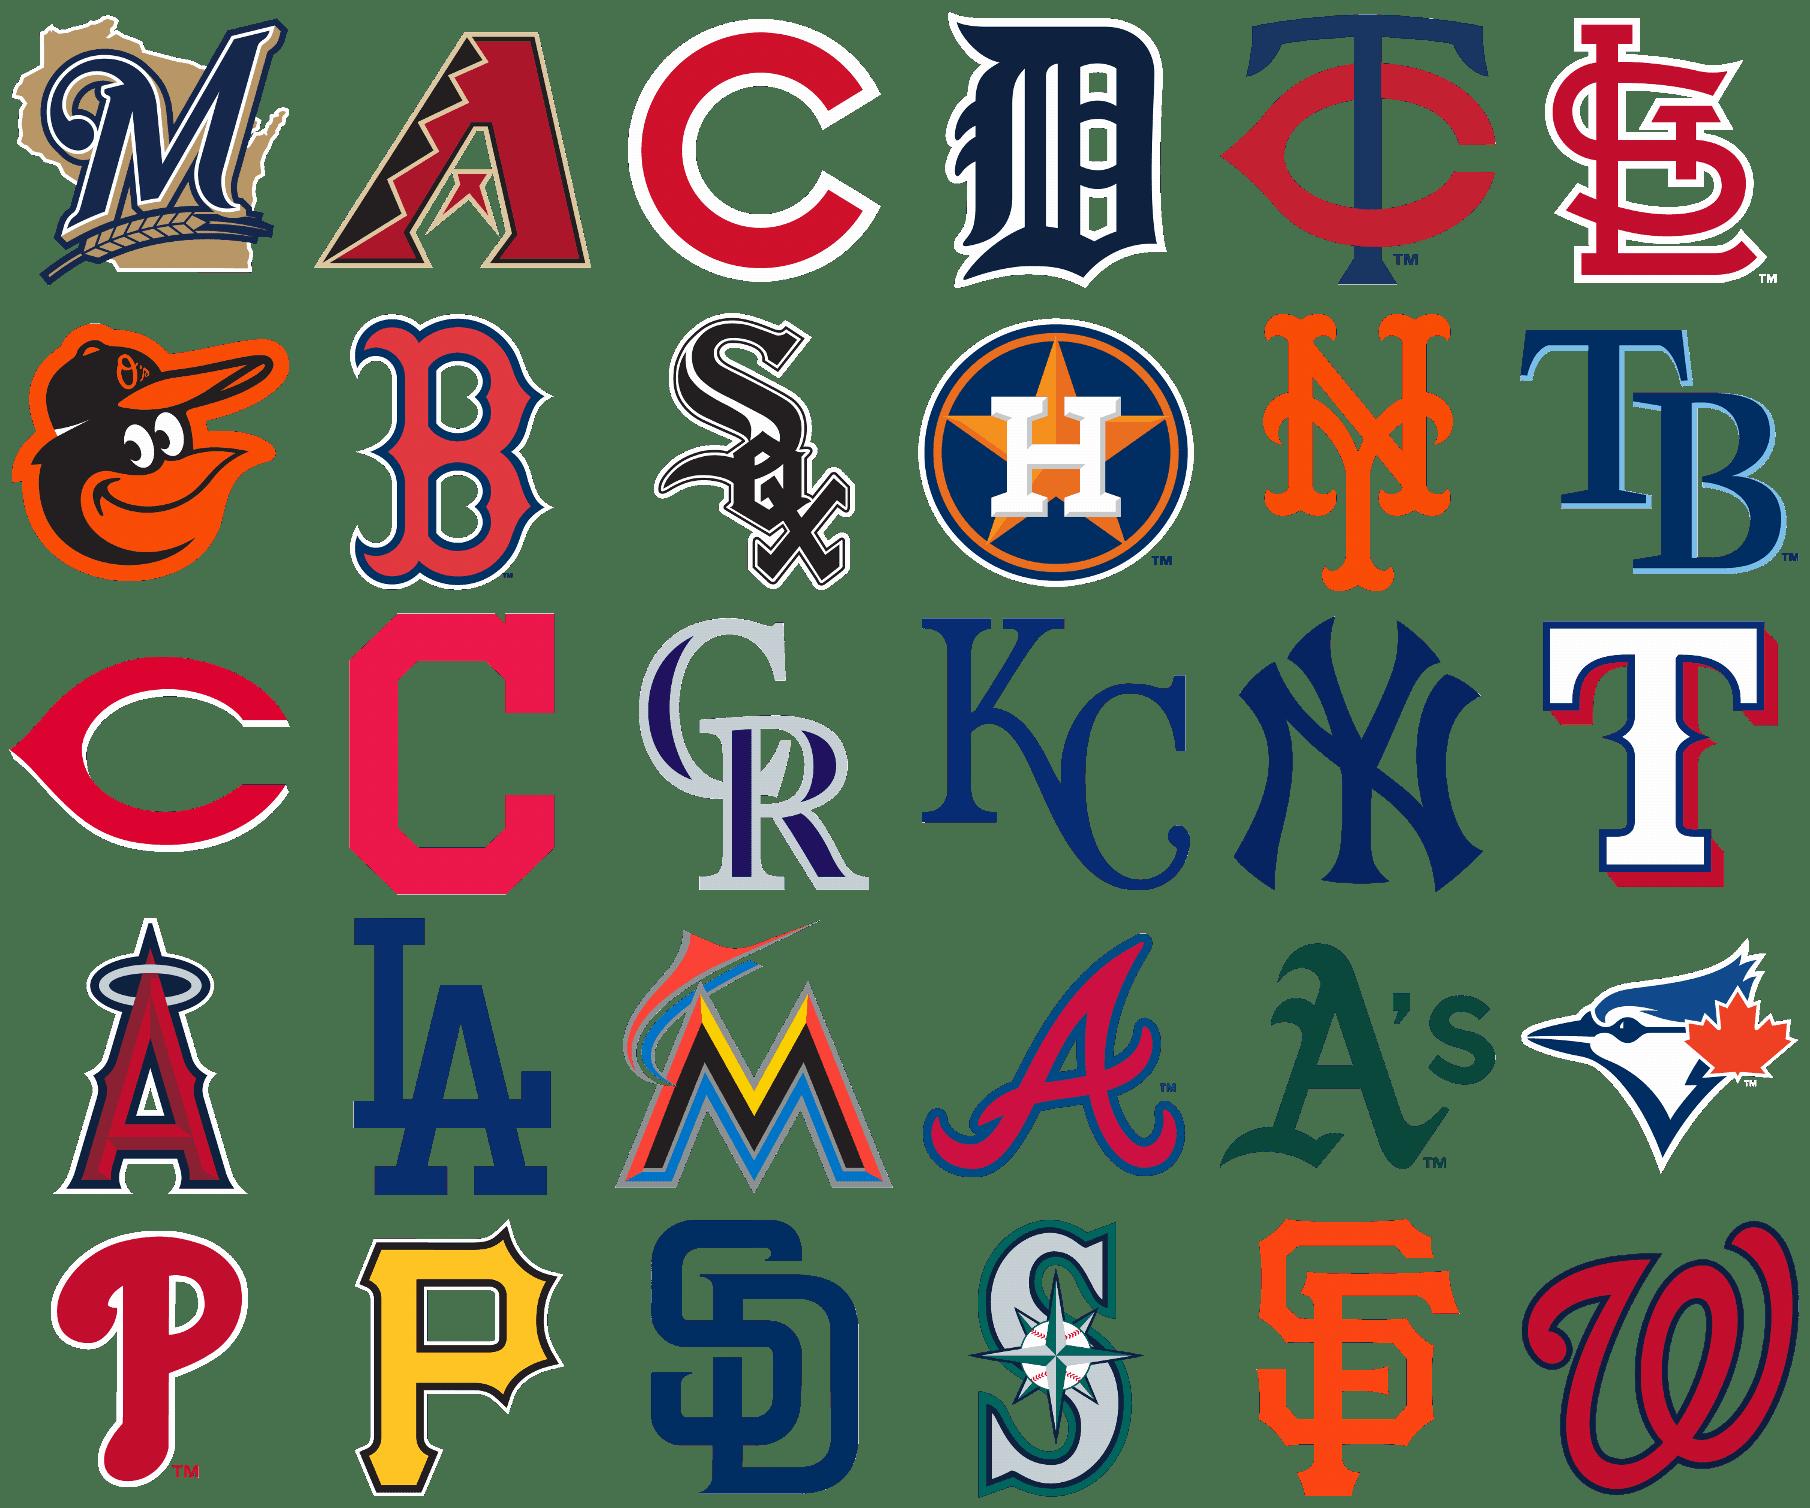 2016 MLB Predictions | FiveThirtyEight